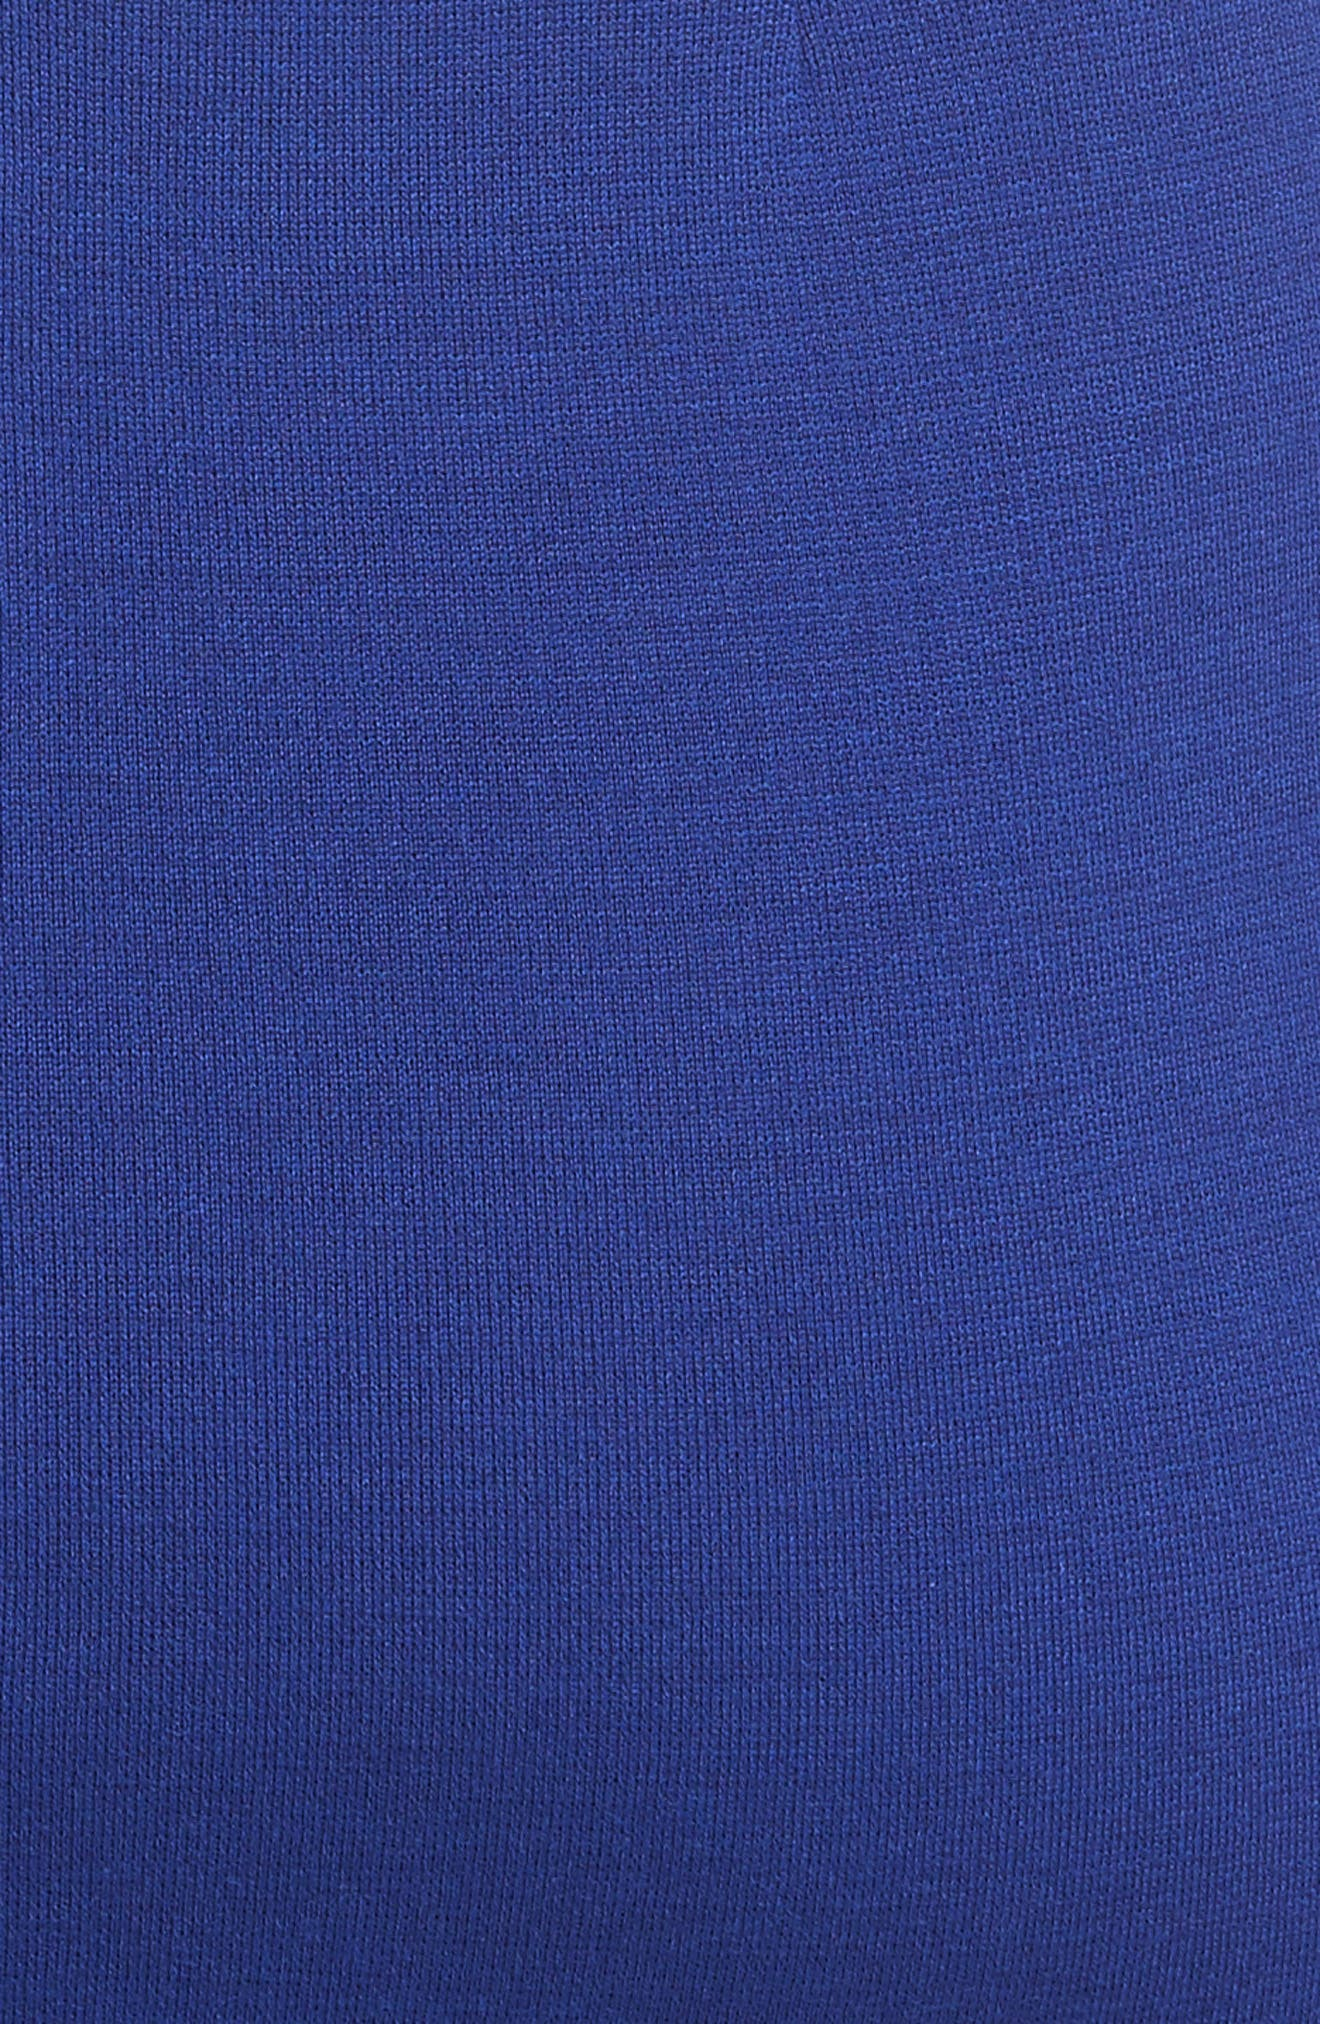 Alternate Image 5  - St. John Collection Milano Knit Sheath Dress